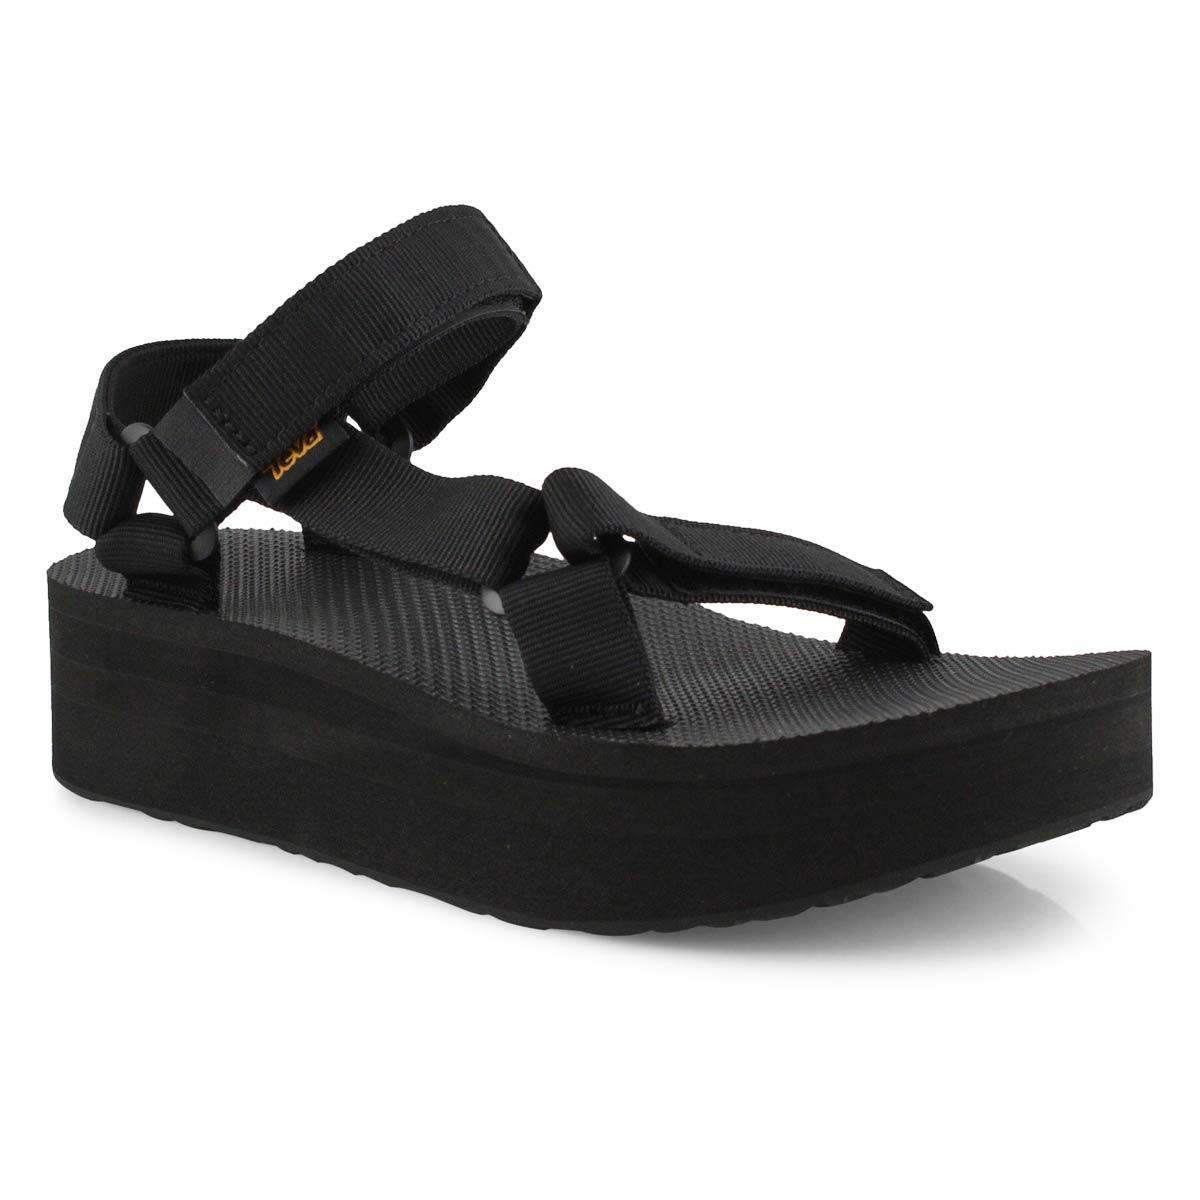 Women's Flatform Universal Sandal - Black